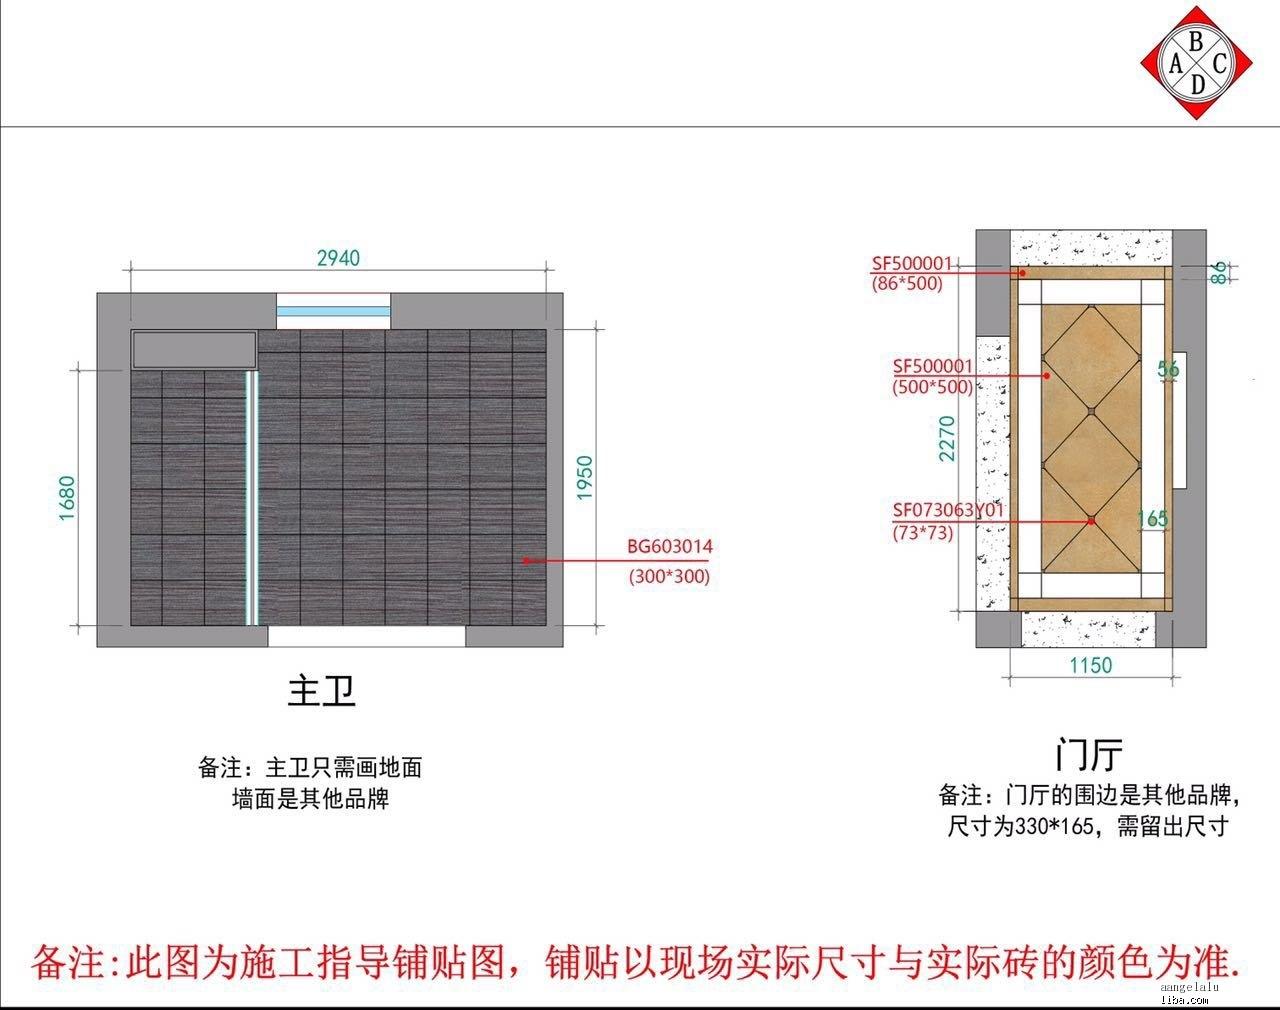 new image - ez4nq.jpg